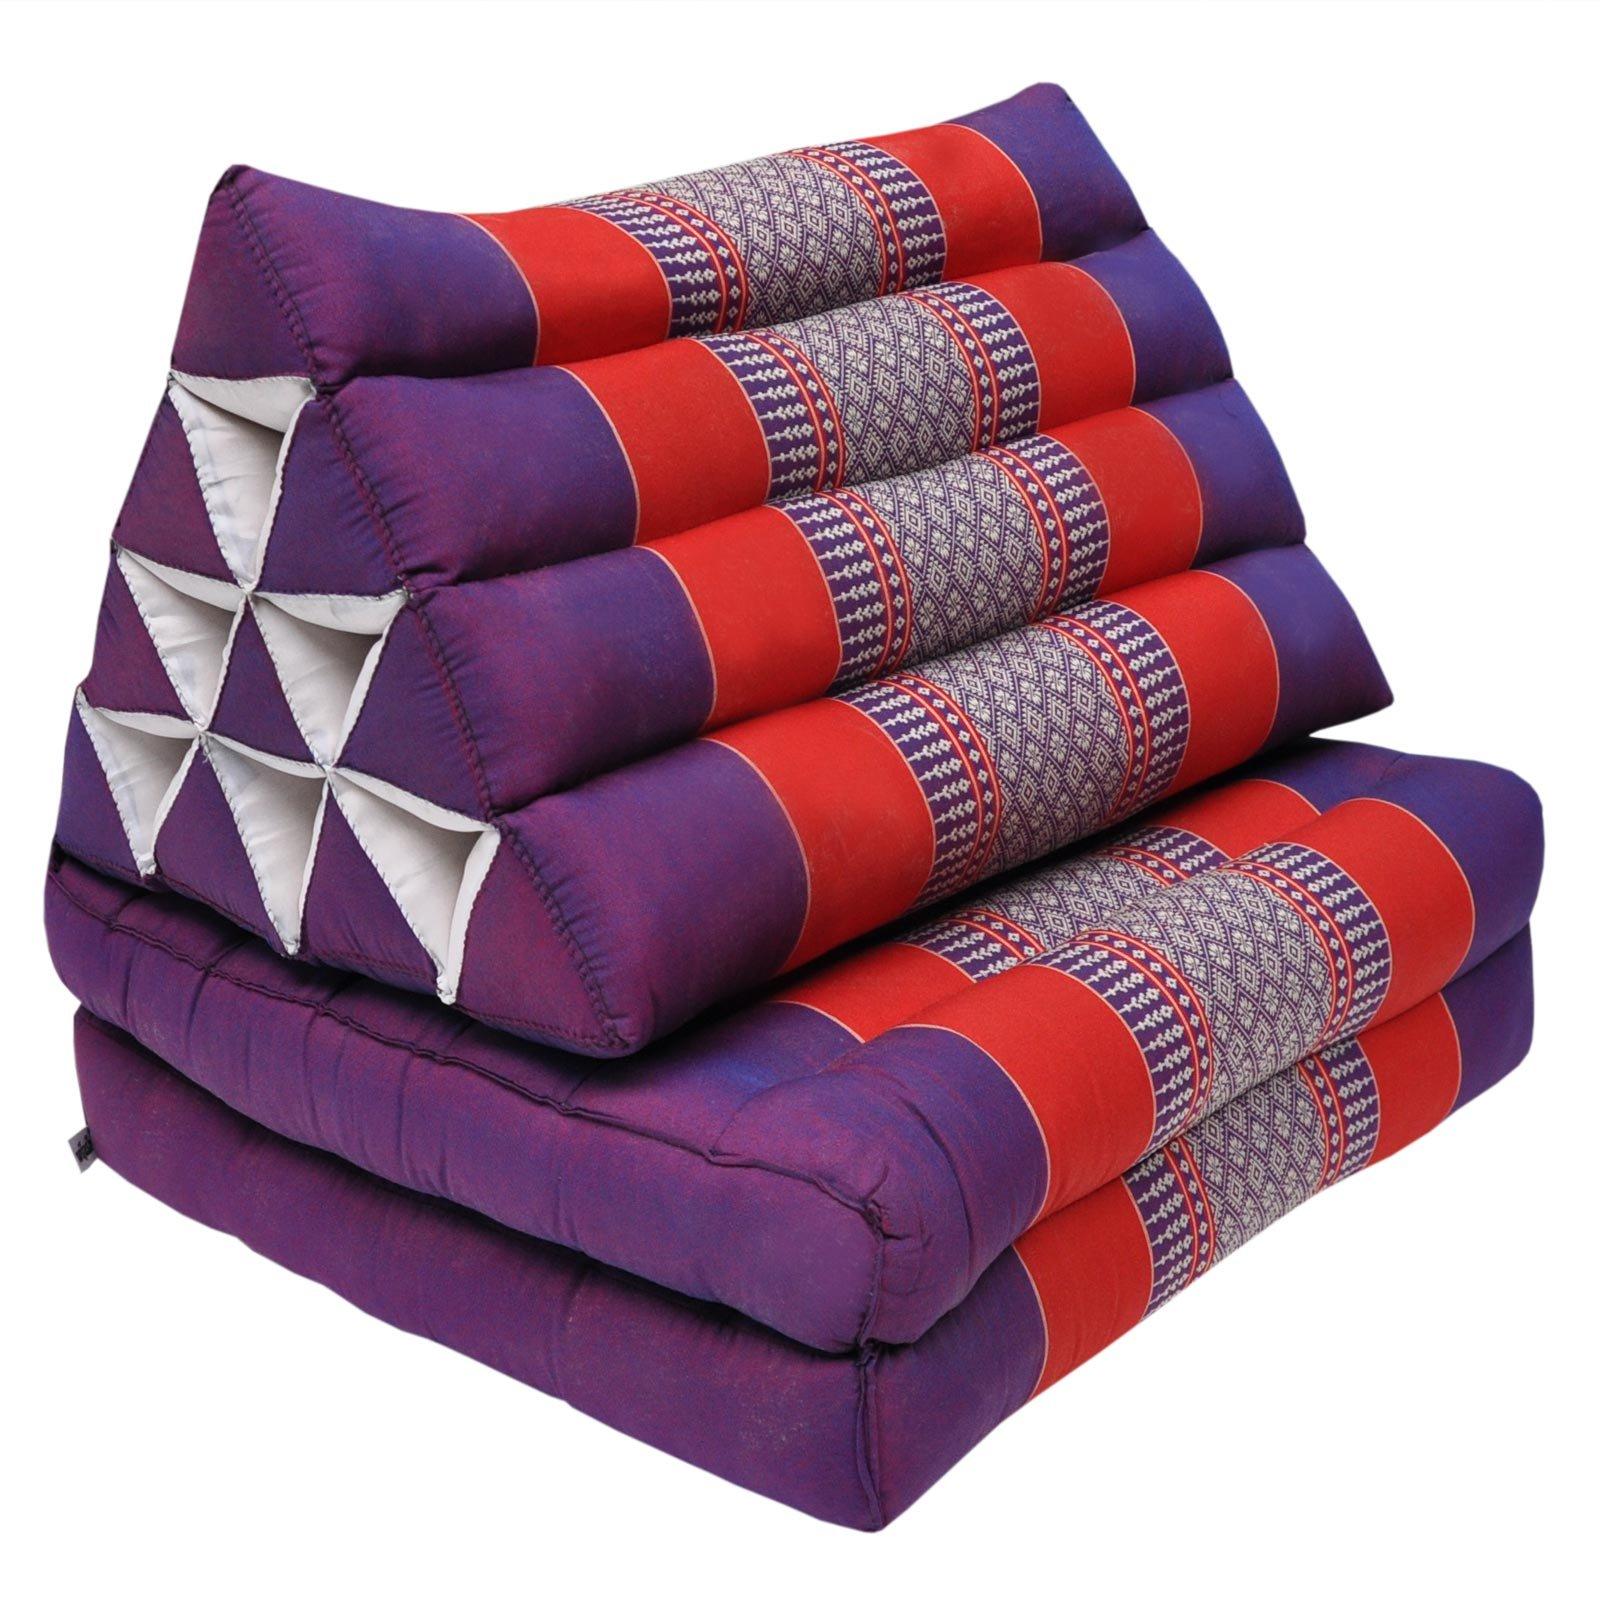 Thai triangular cushion with mattress 2 folds, relaxation, beach, pool, meditation garden Violet/Red (81502)